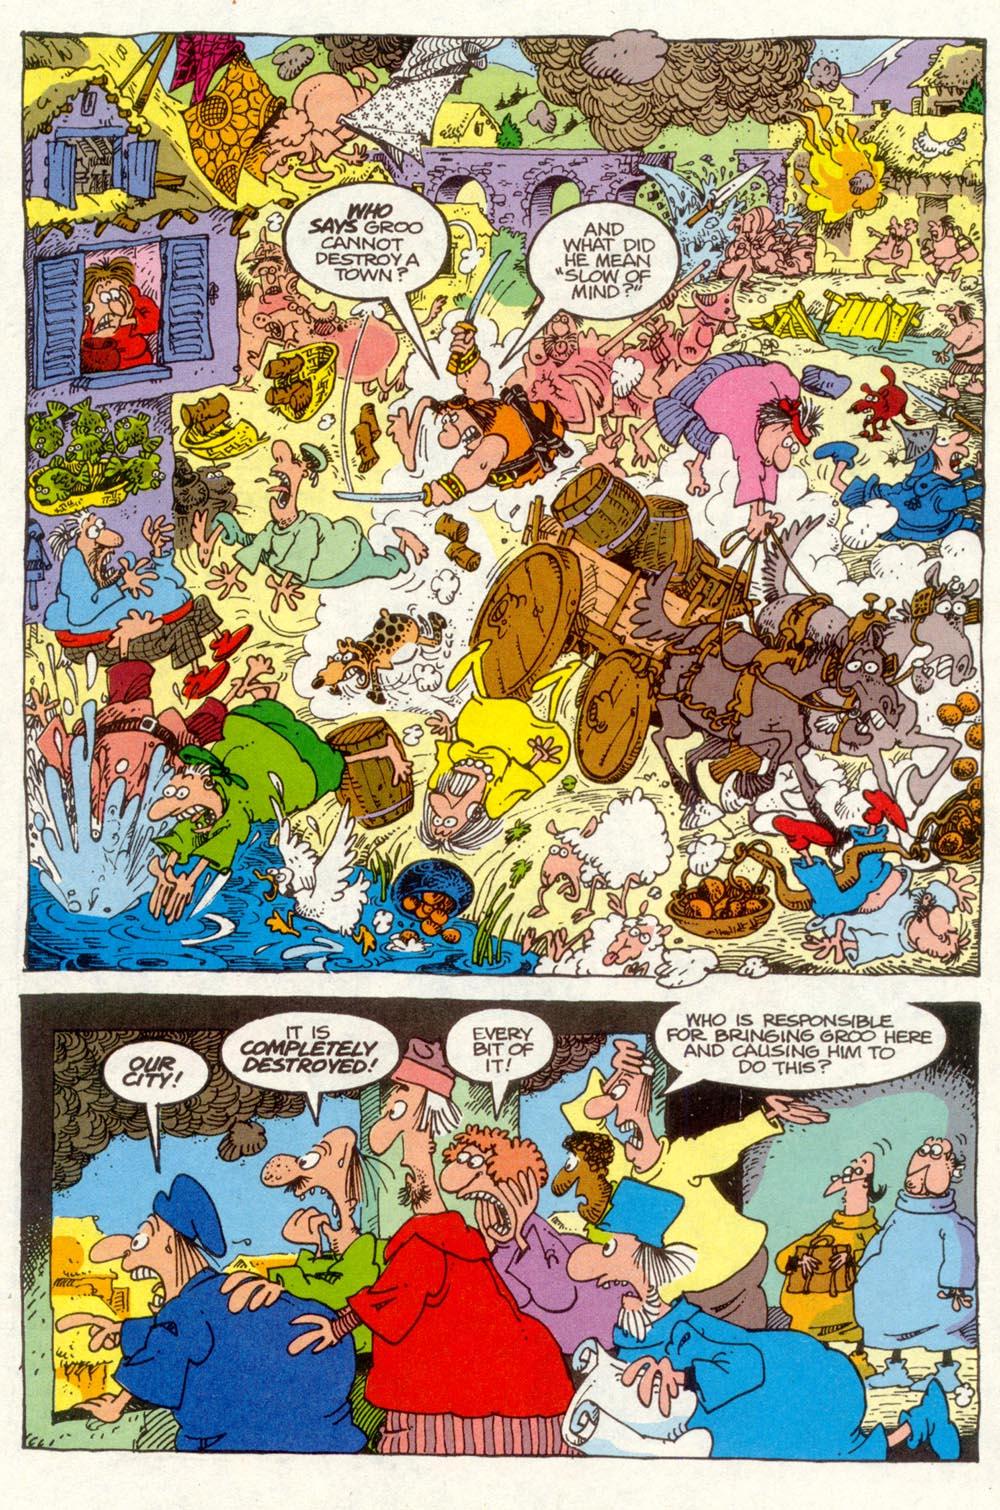 Read online Sergio Aragonés Groo the Wanderer comic -  Issue #90 - 22